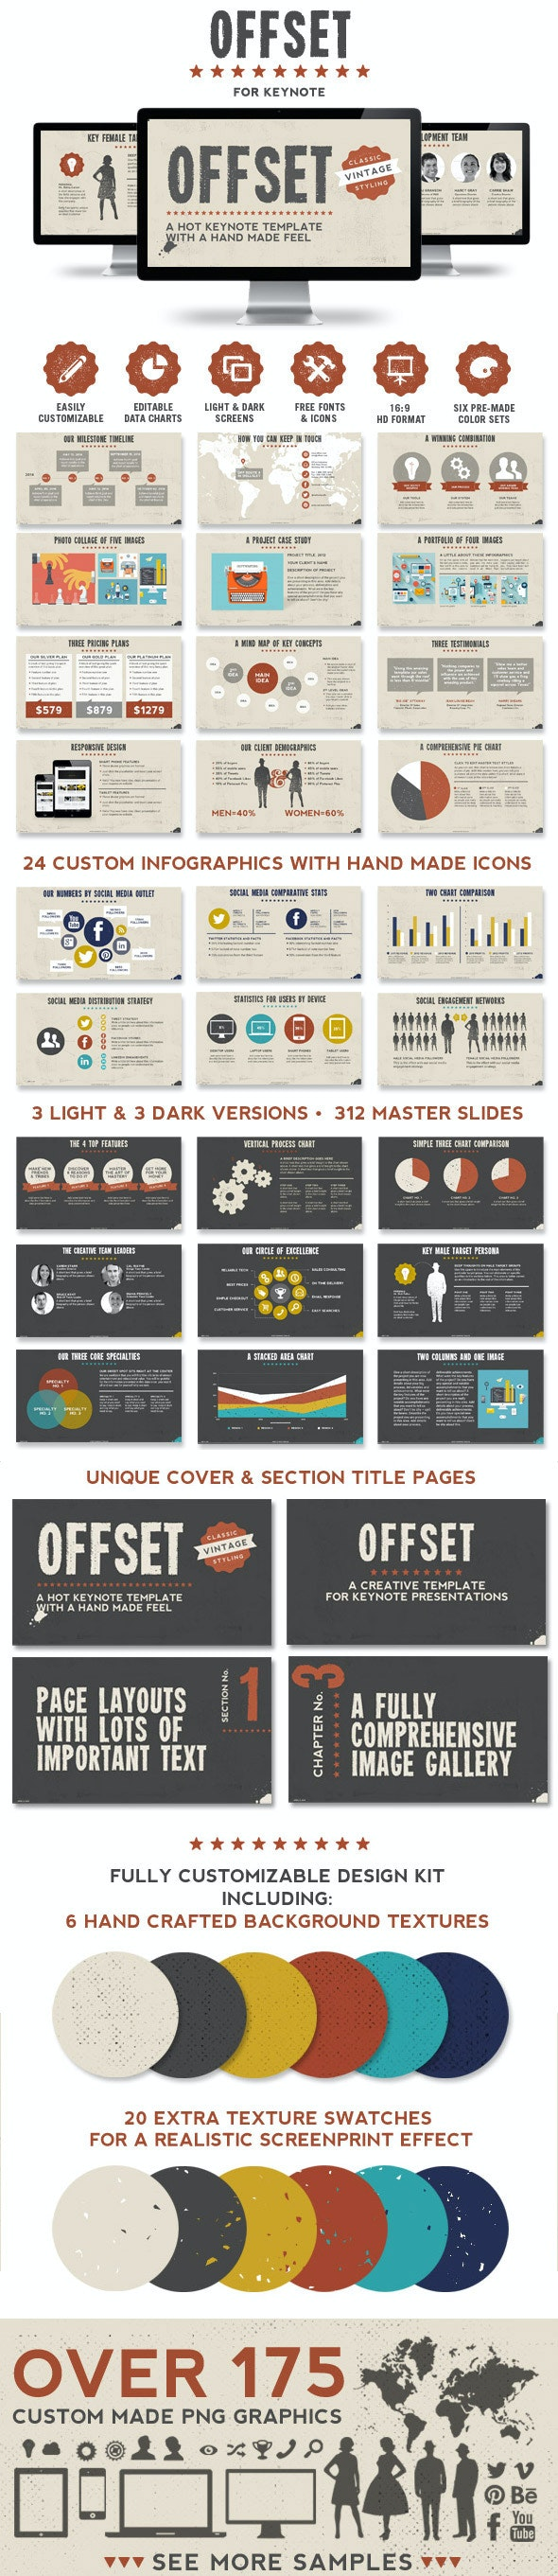 Offset Keynote Presentation Template - Creative Keynote Templates